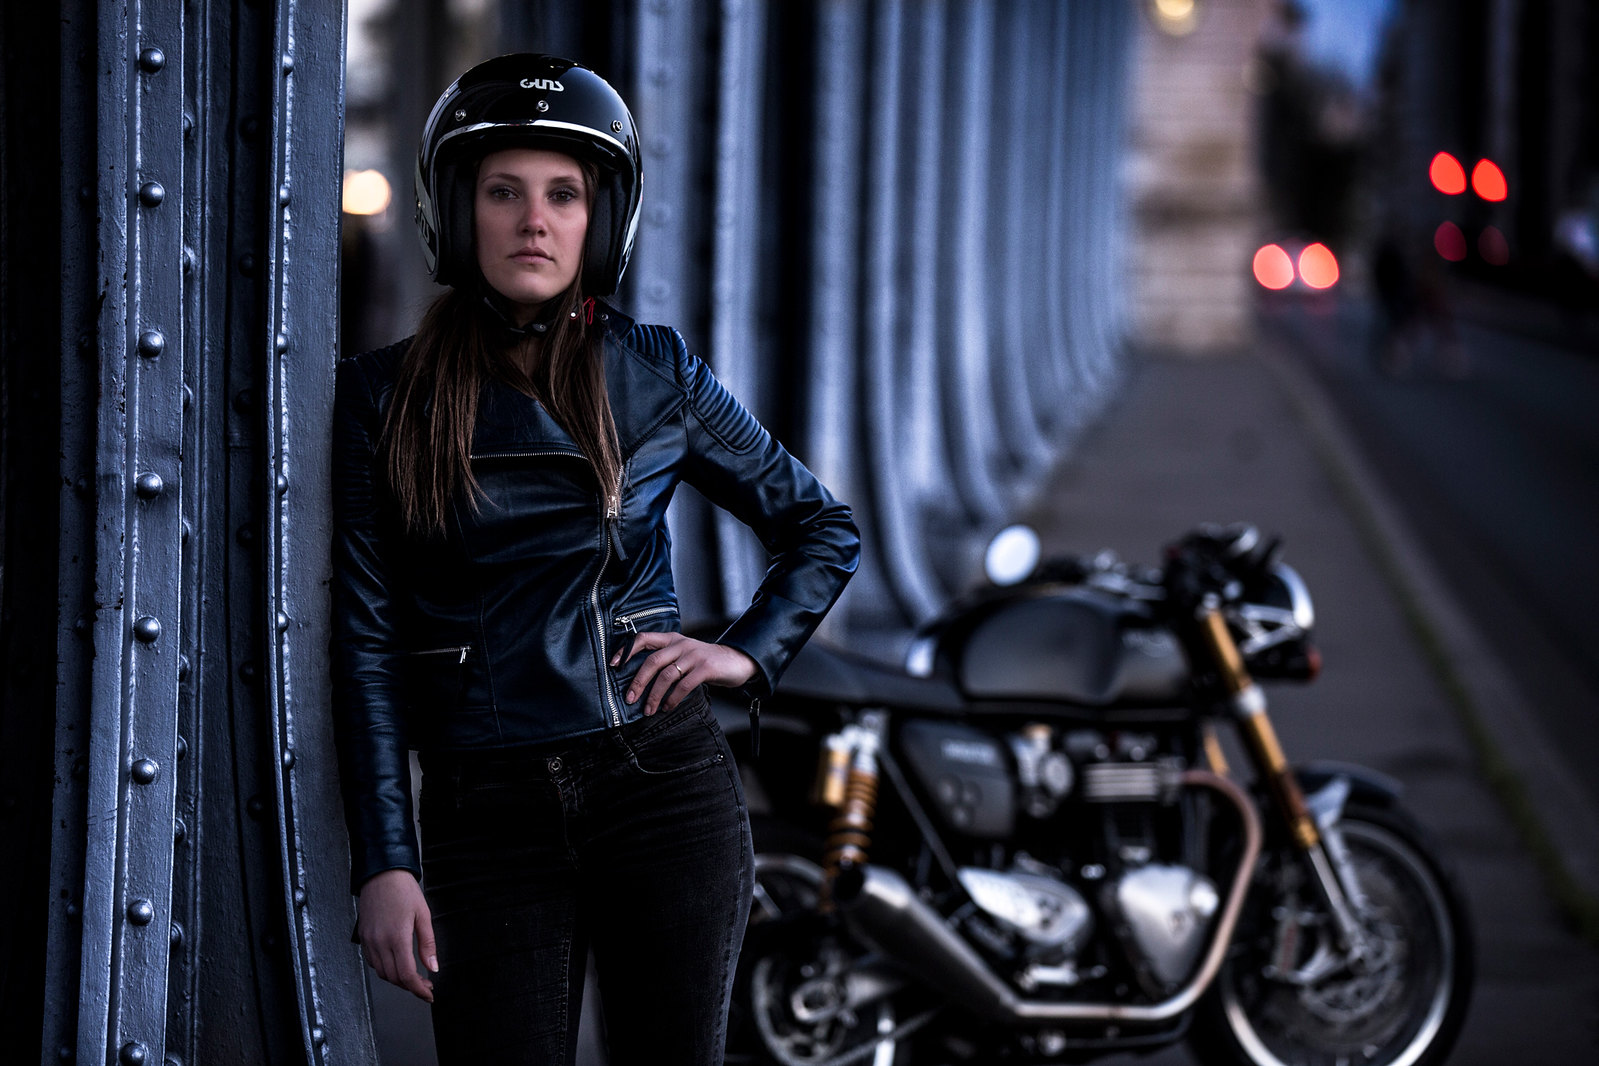 Essai moto Triumph Thruxton R par Lily